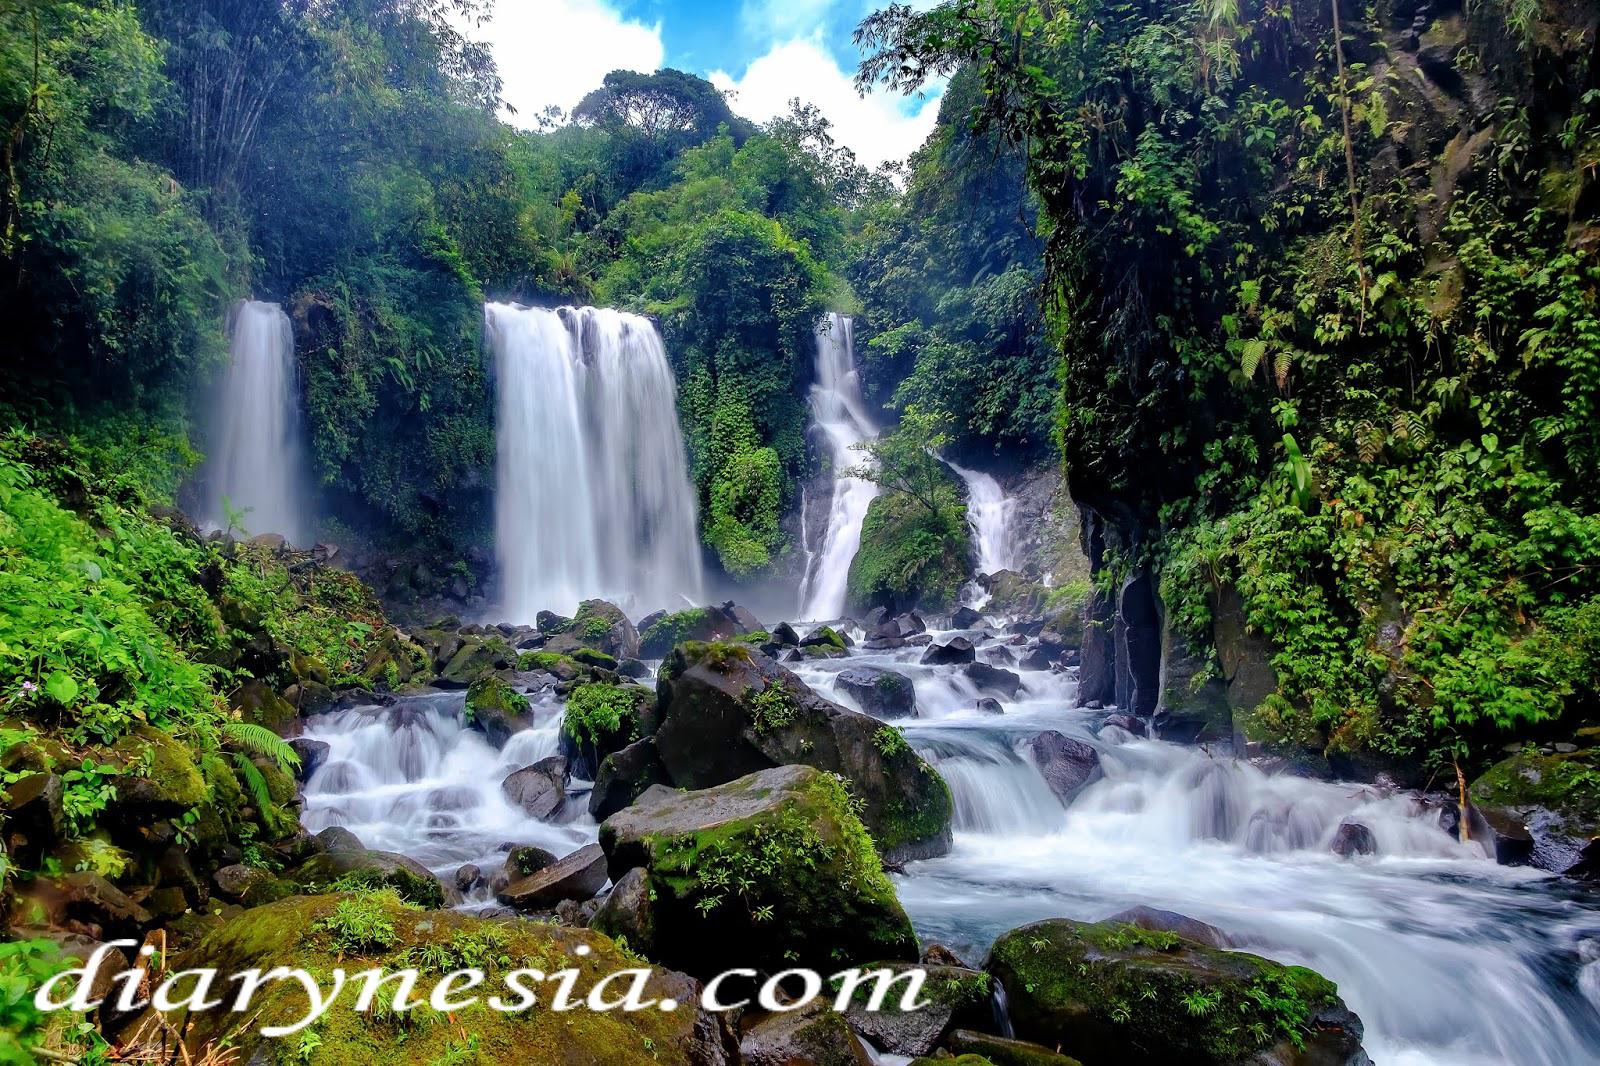 baturraden tourism, banyumas tourism, central java tourism, diarynesia